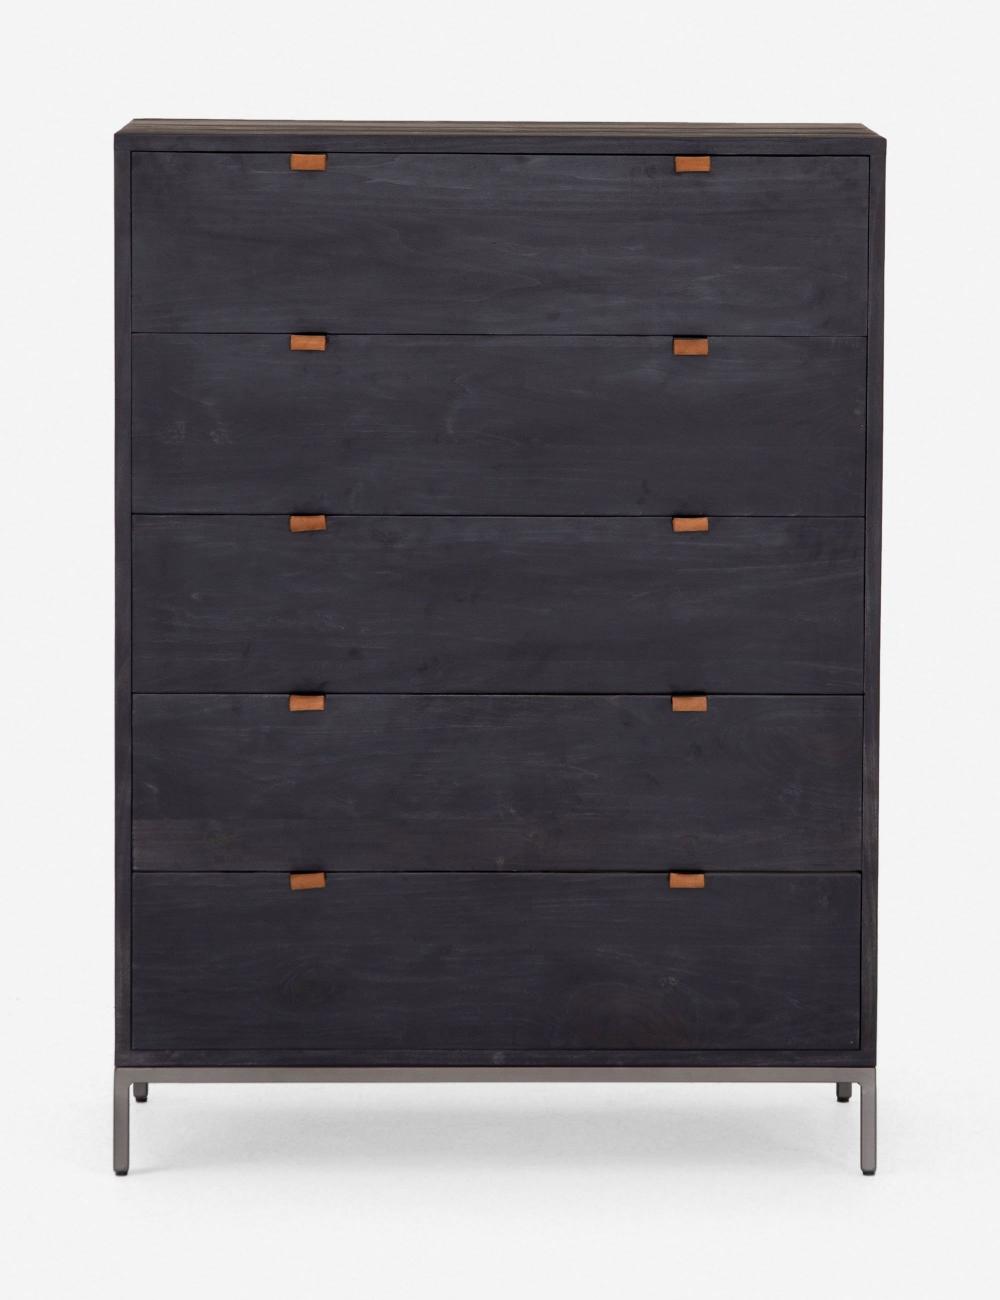 Rosamonde 5 Drawer Dresser Wooden Dresser 5 Drawer Dresser Dresser [ 1300 x 1000 Pixel ]